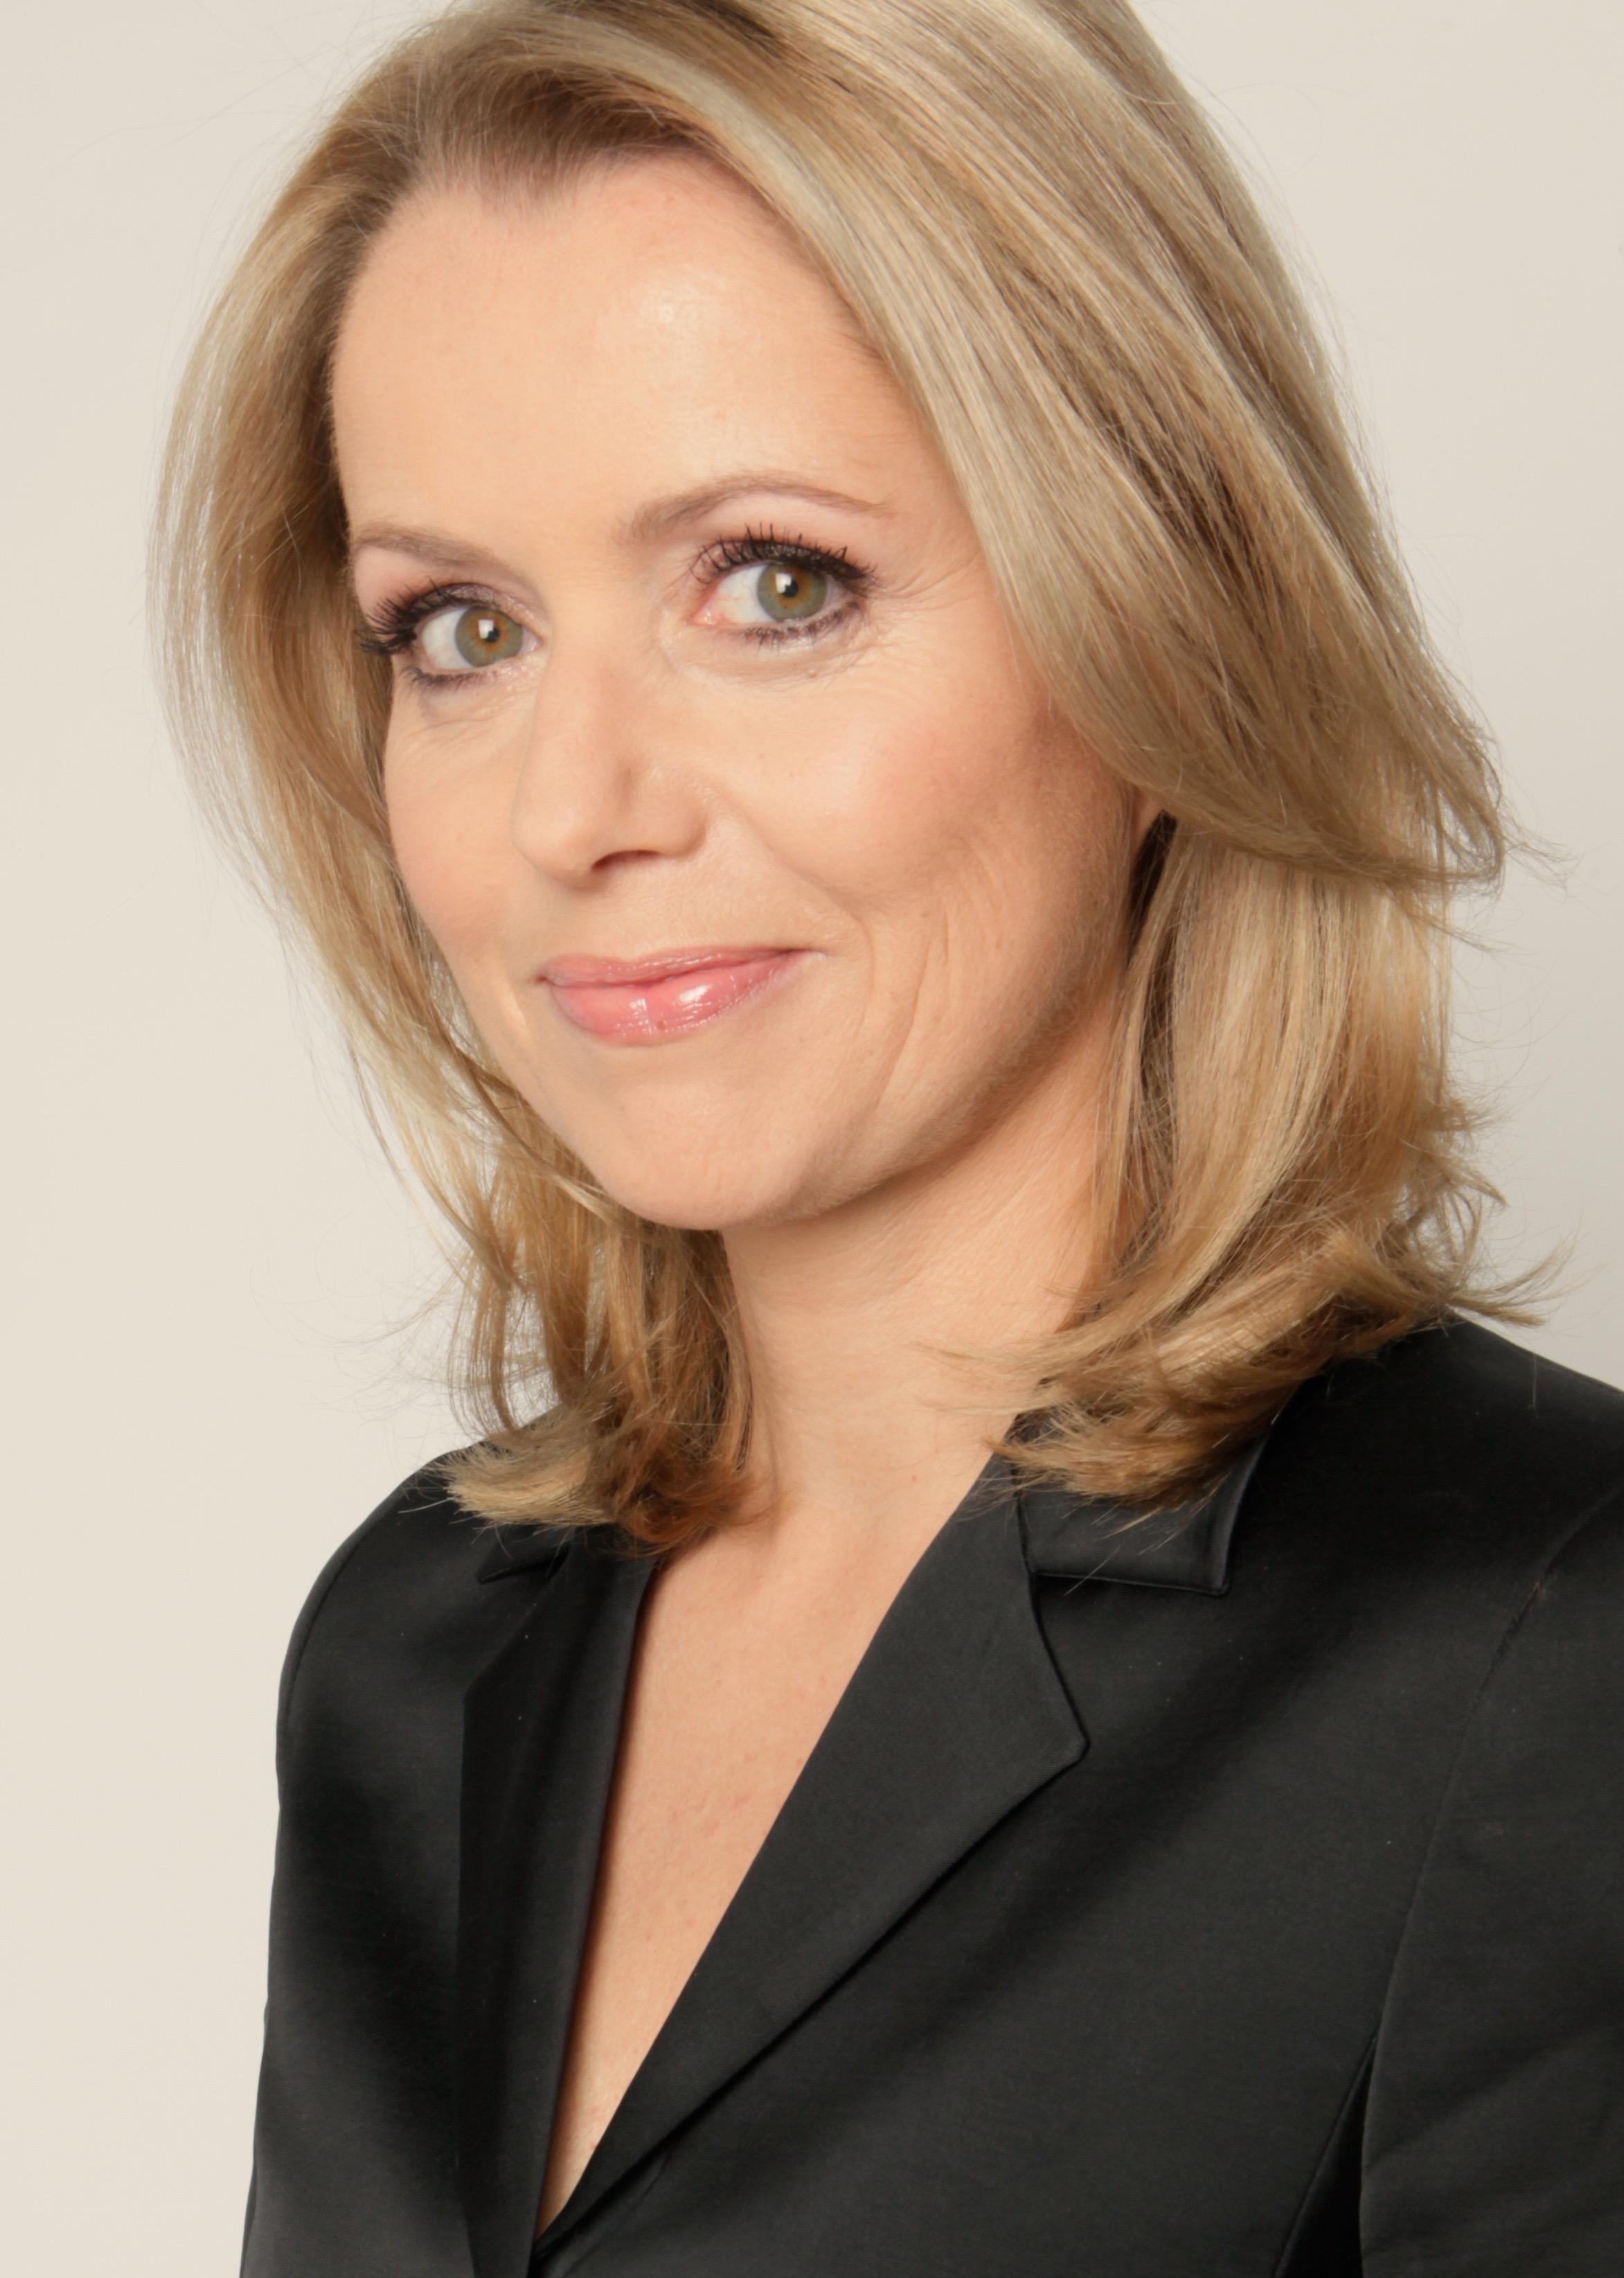 Expert Marketplace - Dipl.Journ. Astrid Frohloff - Portrait